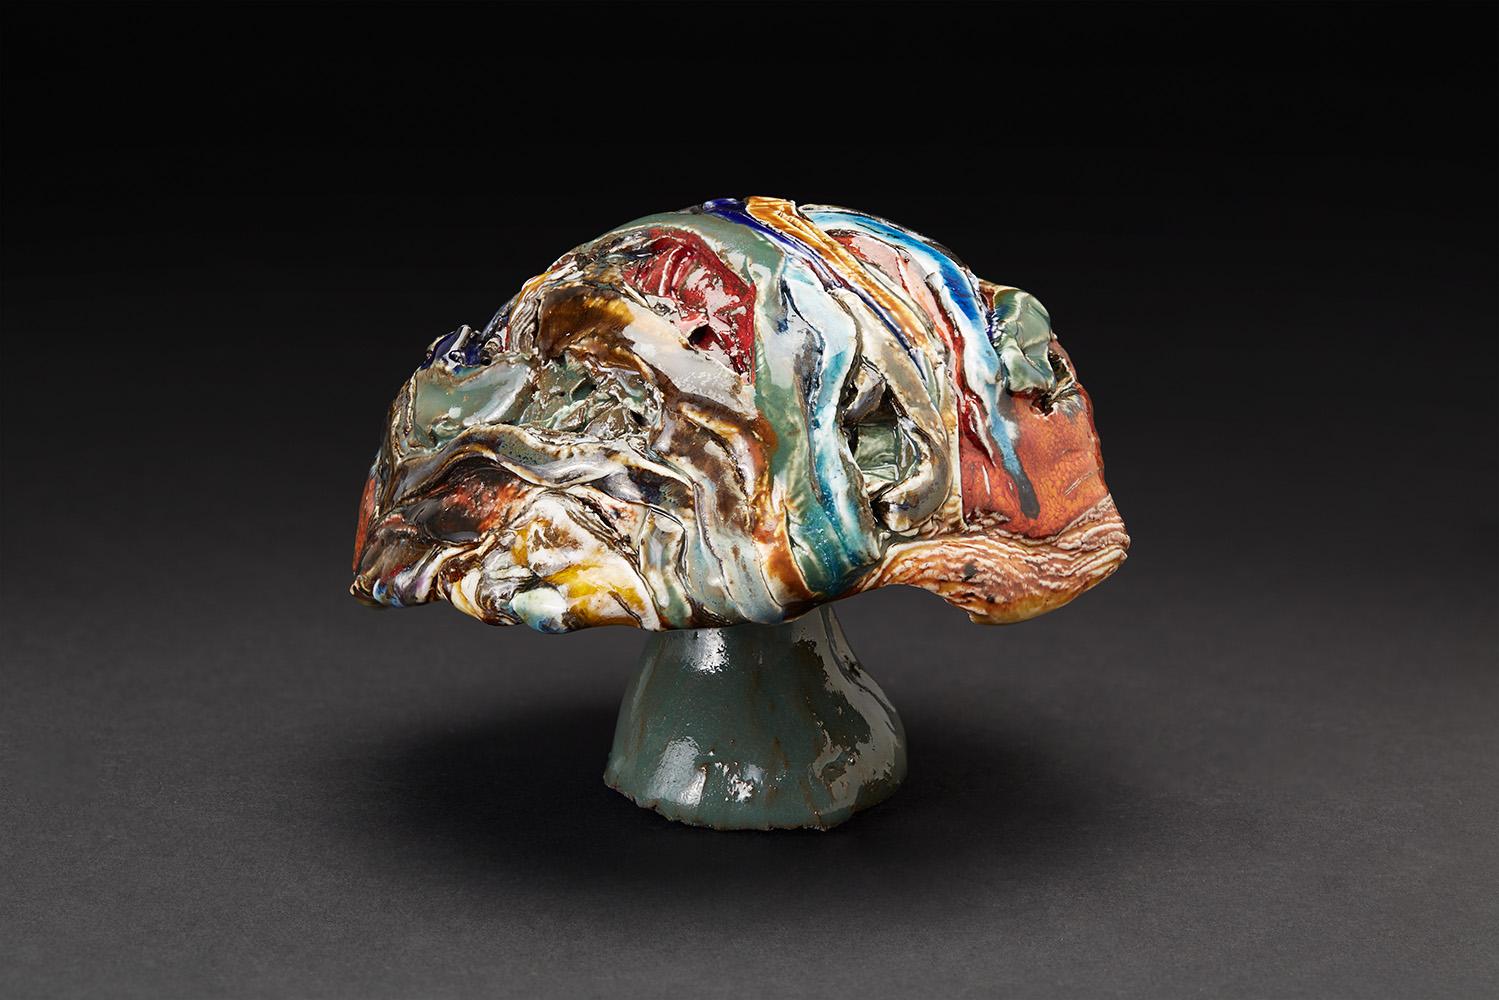 Straiph Wilson    Balsur  , 2017 Ceramic 4.25 x 5 x 5.25 inches 10.8 x 12.7 x 13.3 cm StWi 14